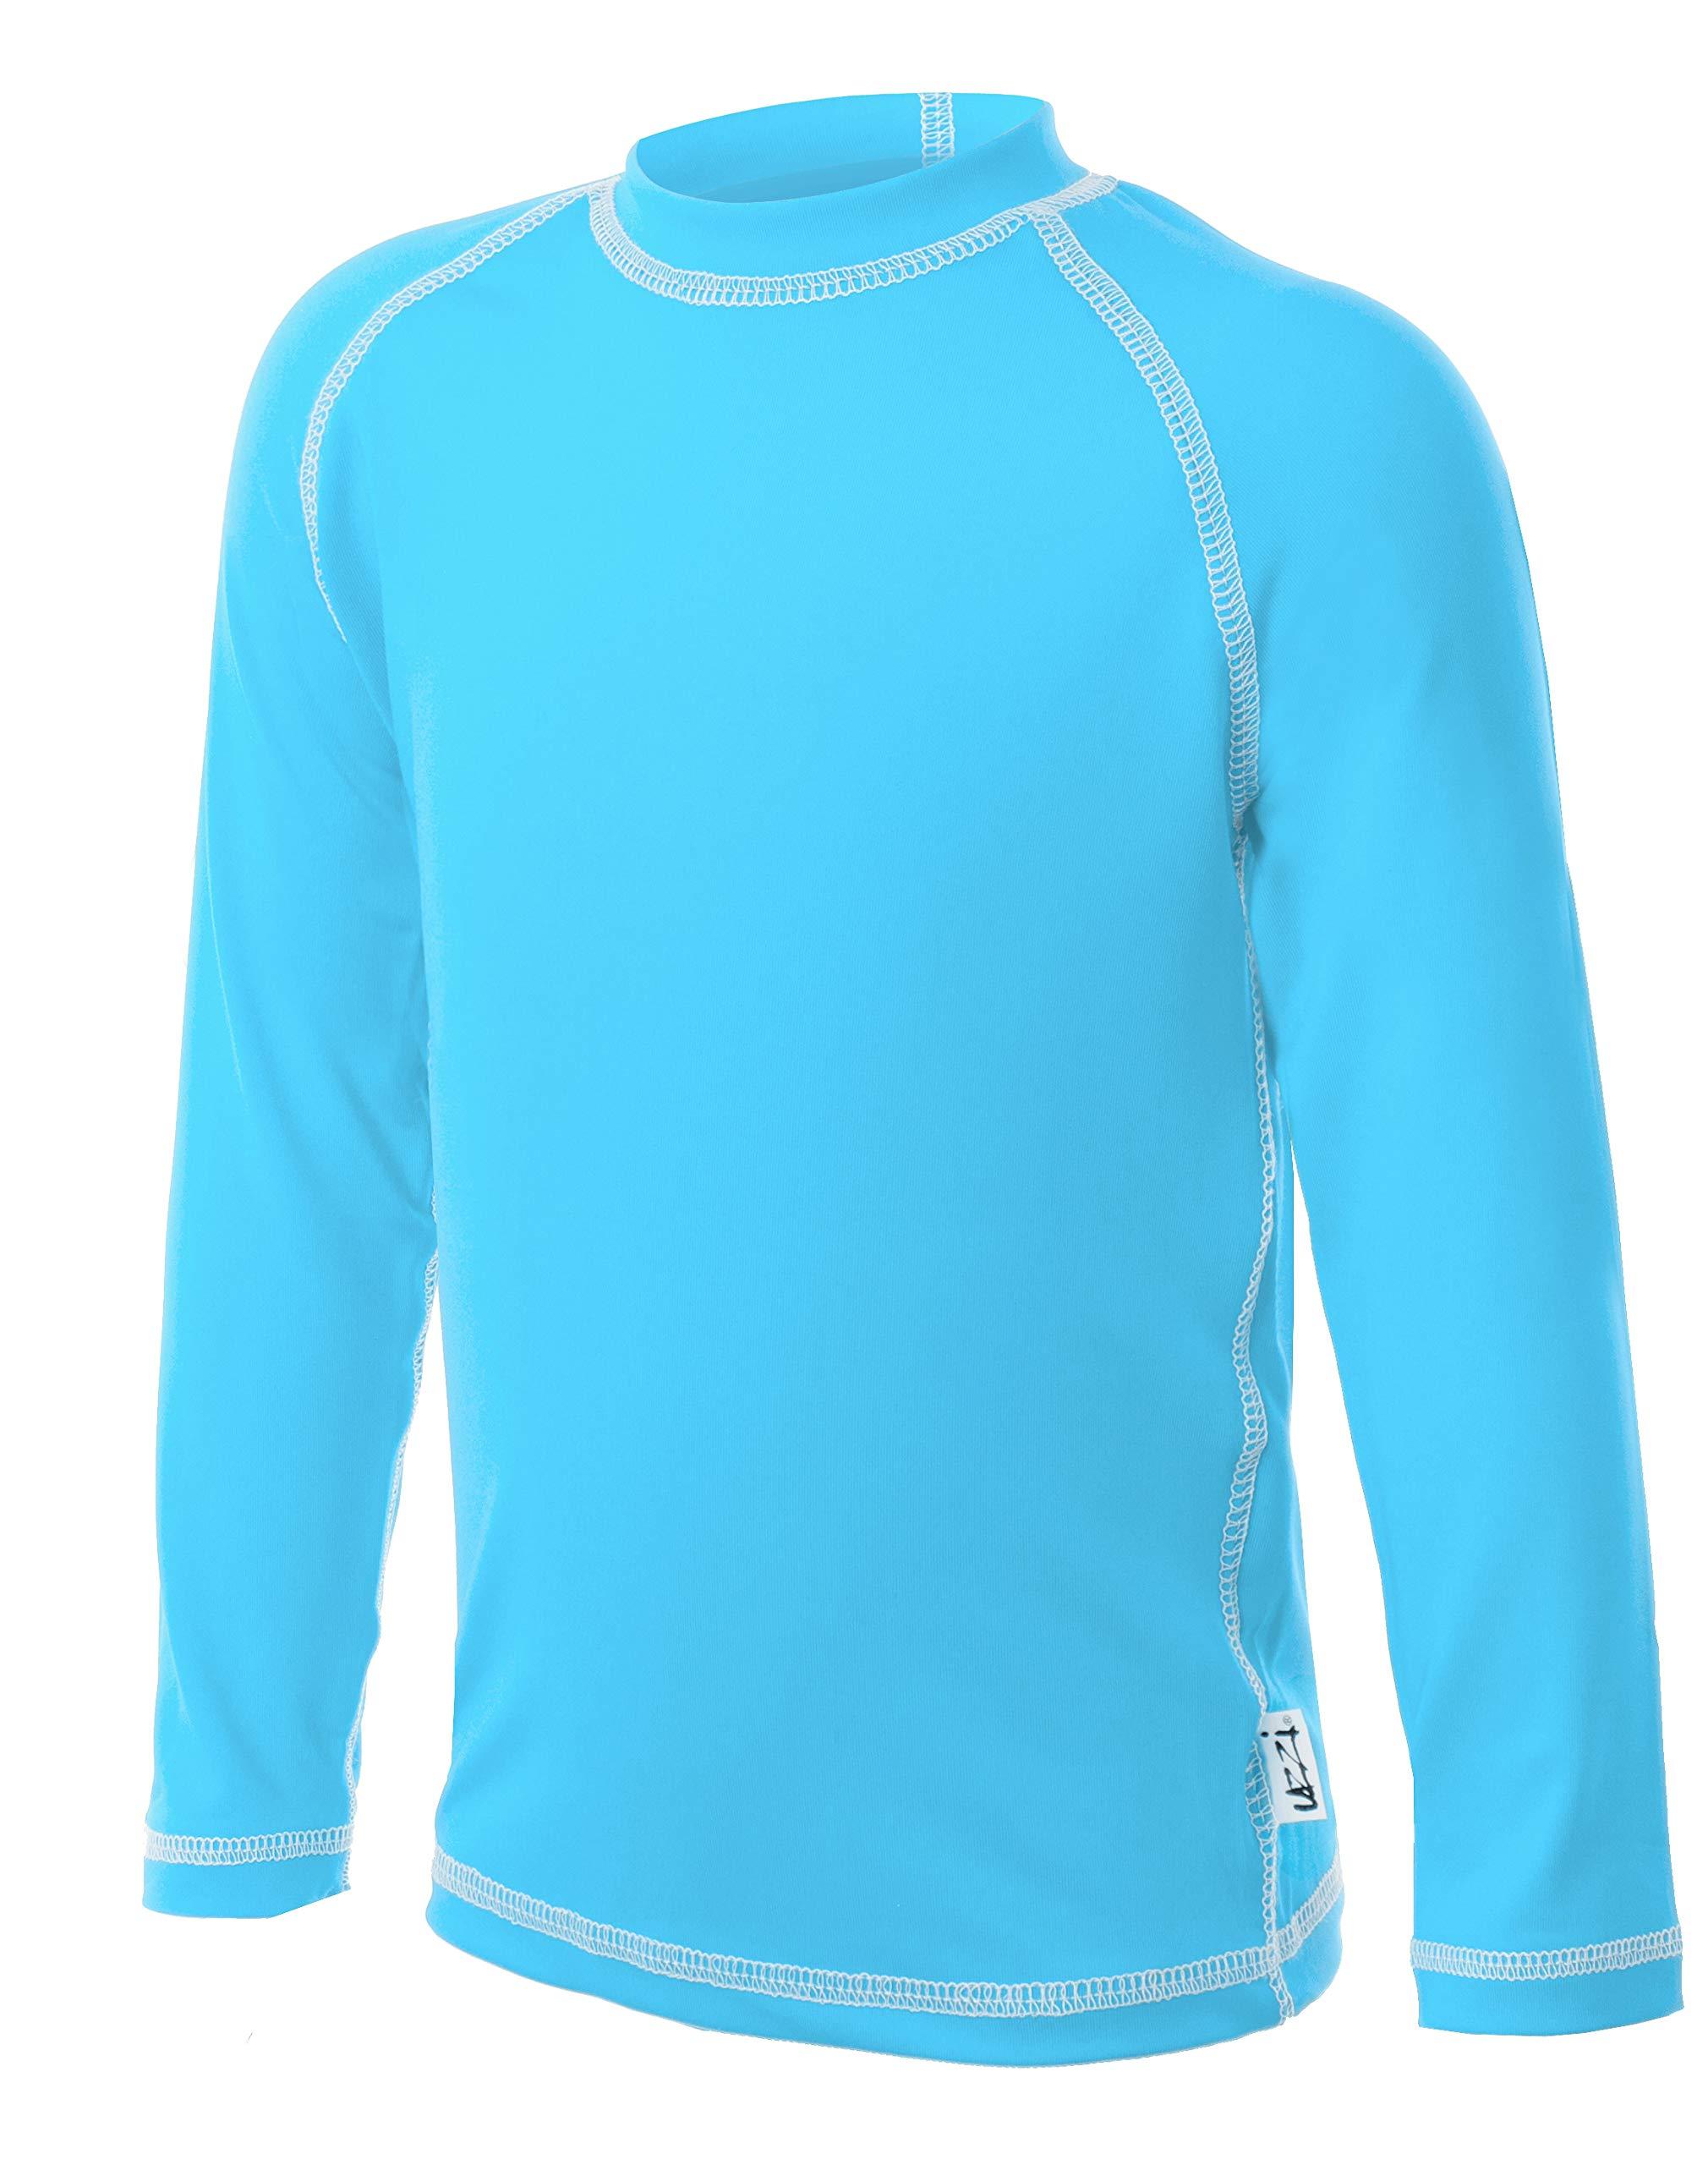 UZZI Kids UPF 50+ Loose Cut Long Sleeve Rashguard Swim T-Shirt